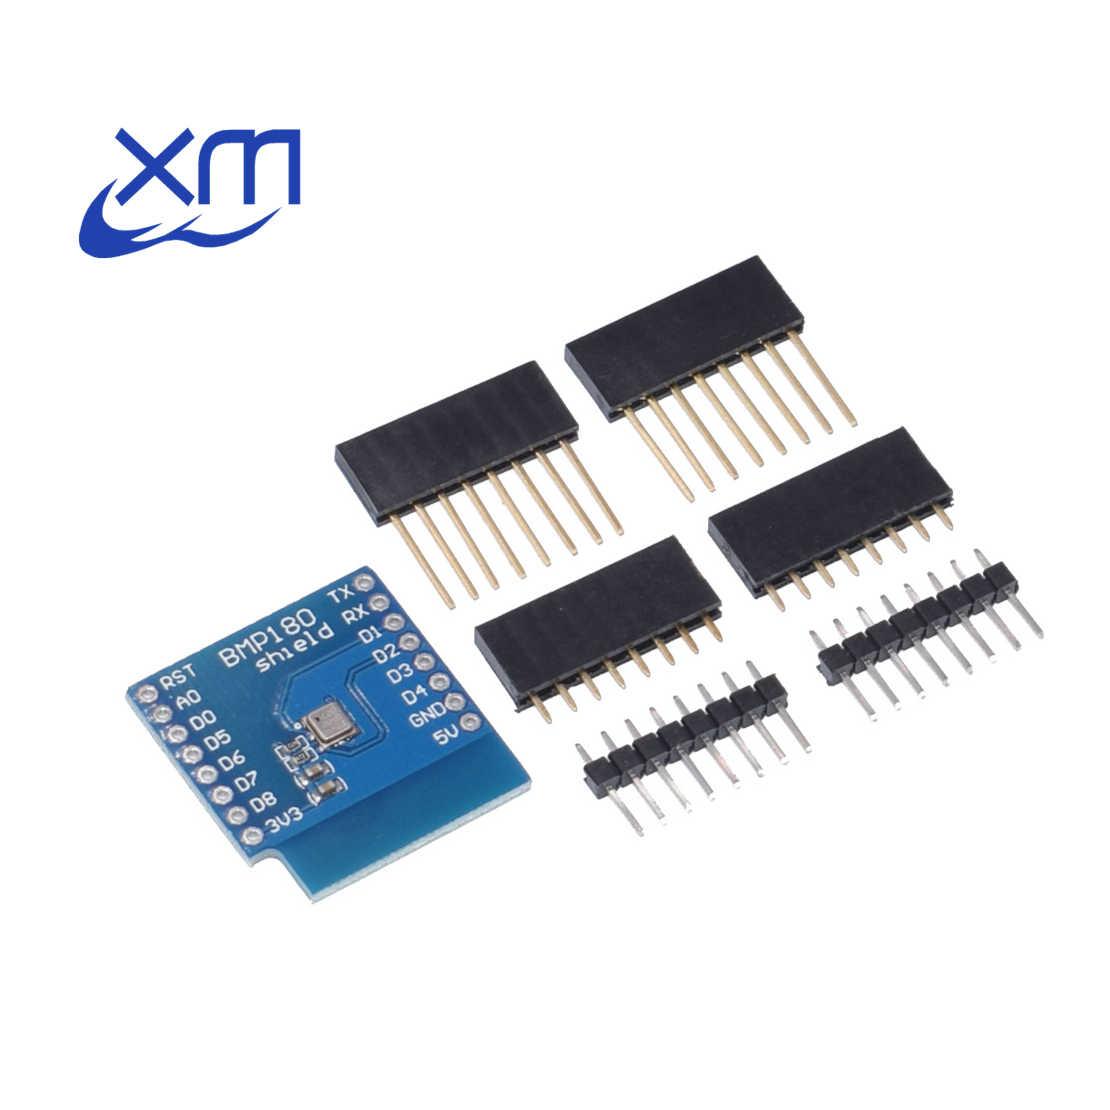 ESP8266 D1 ミニプロ無線lan開発ボードnodemcu protoboard DHT11 DHT22 AM2302 リレーDS18B20 BMP180 用wemos diyキット